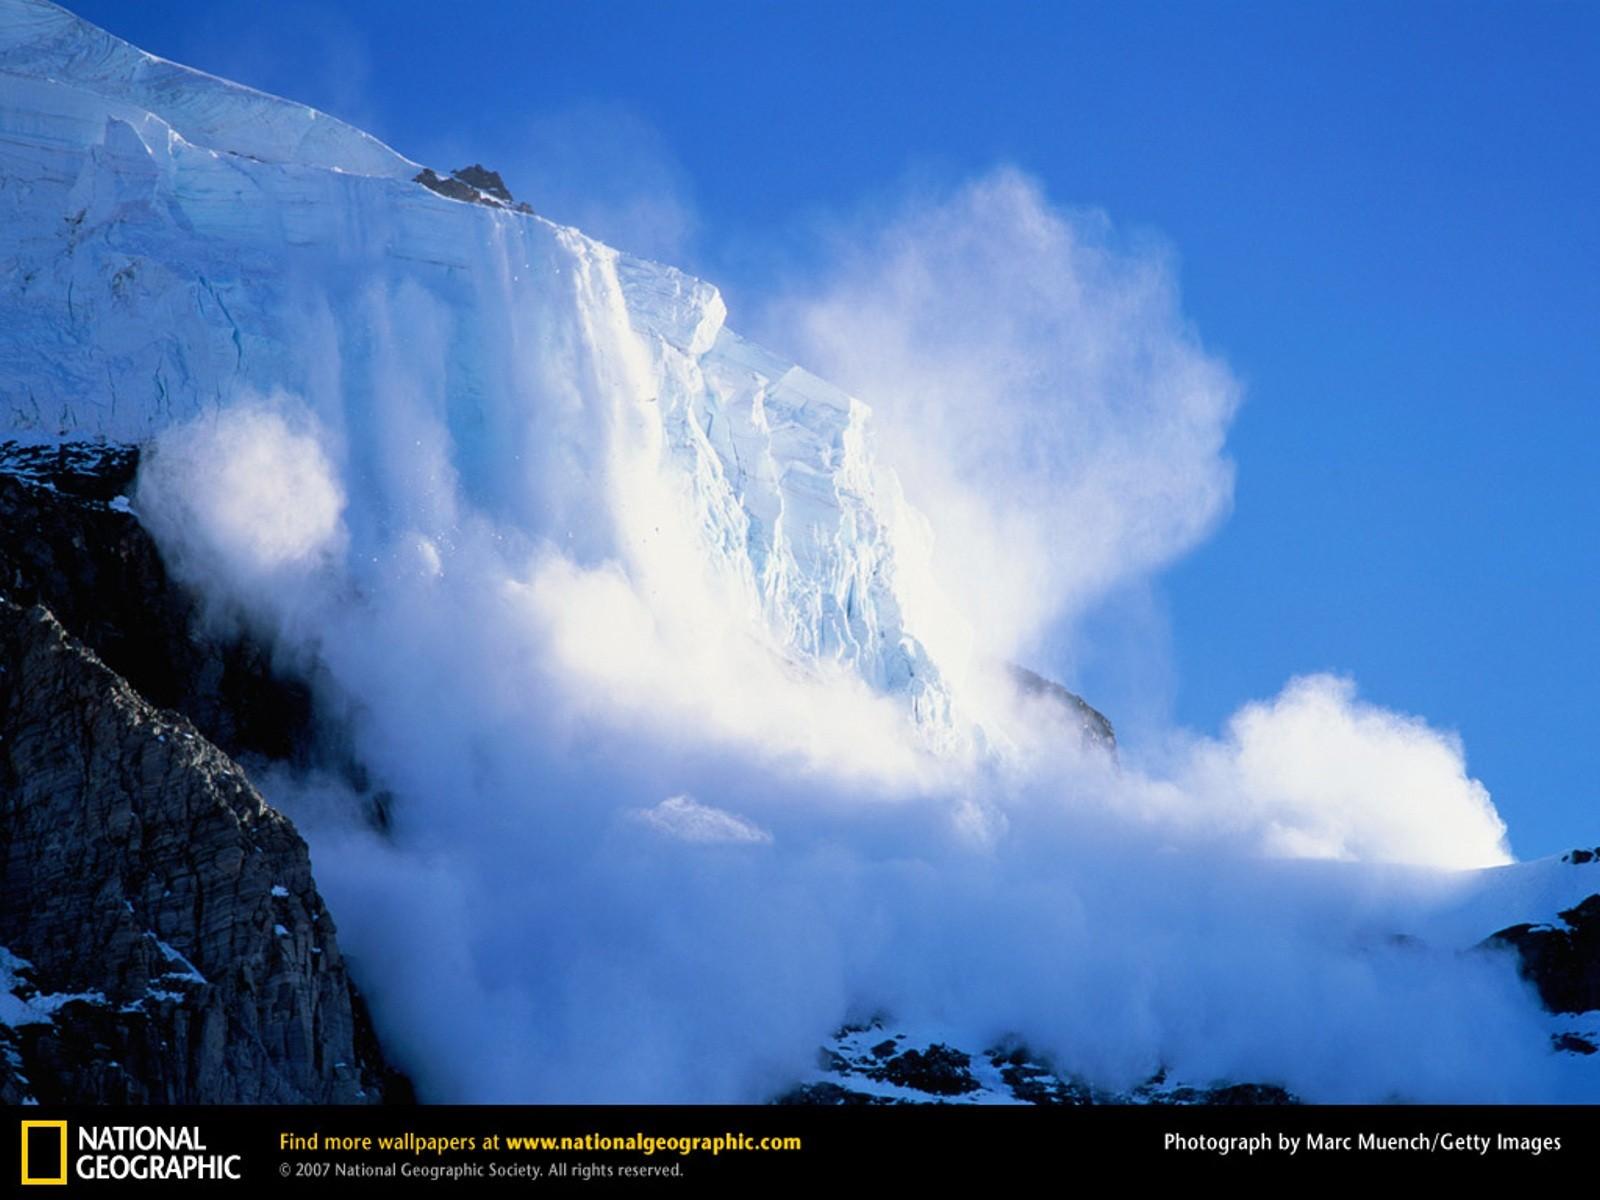 Unique Wallpaper: 100 Most Famous National Geographic HD Wallpaper -Part 9